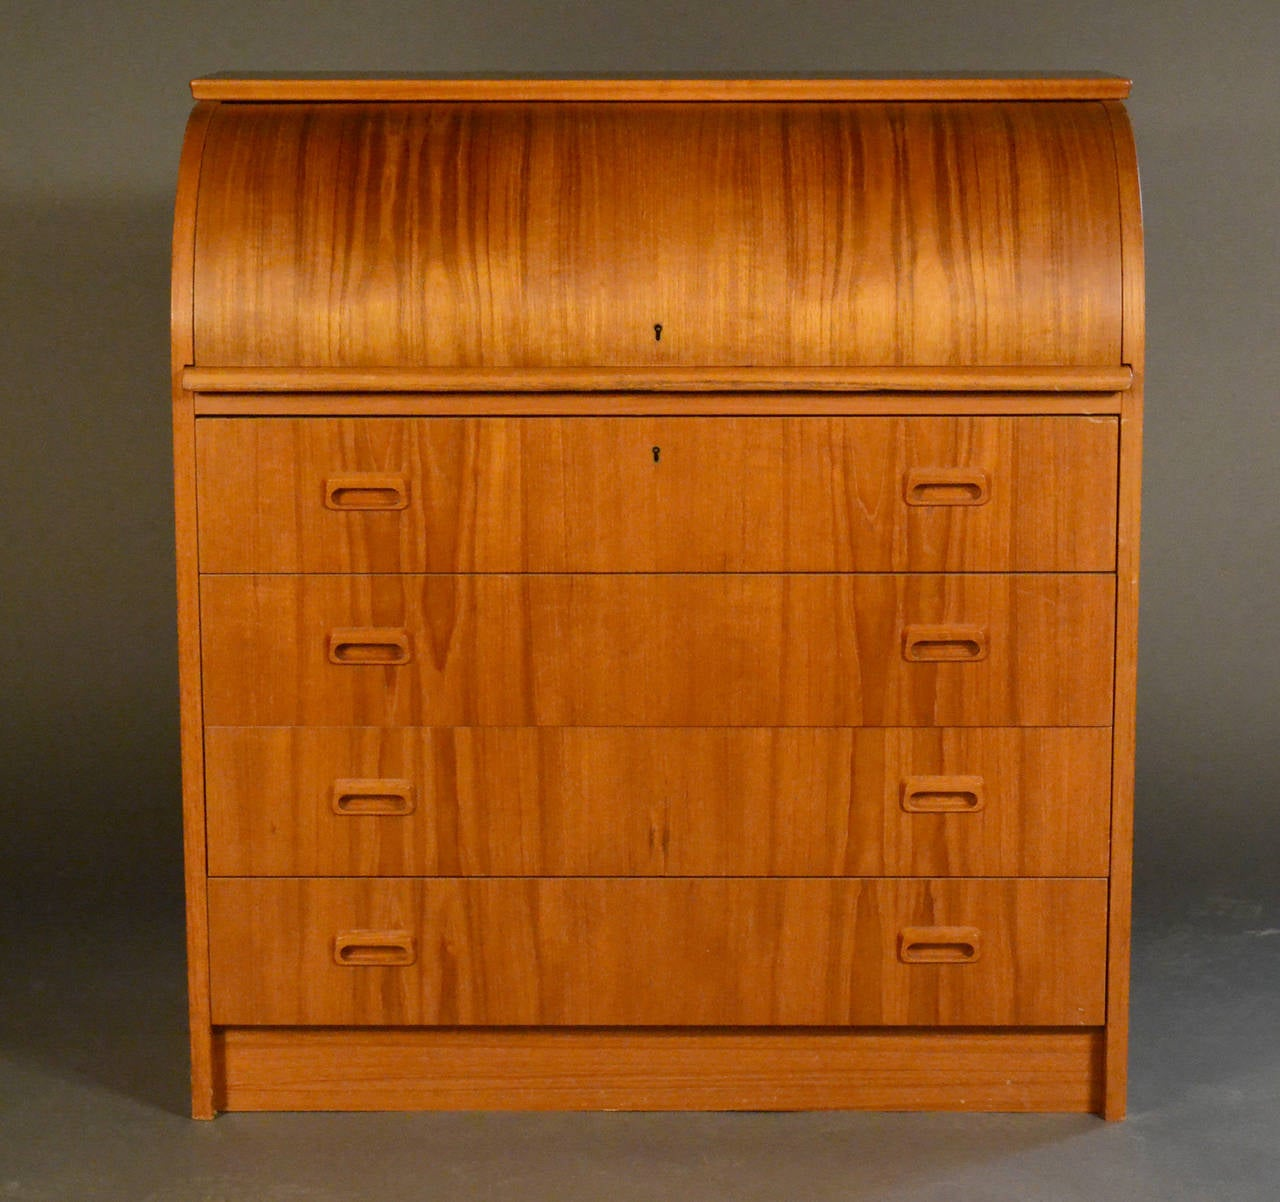 danish teak rolltop desk with four drawers 2 - Rolltop Desk